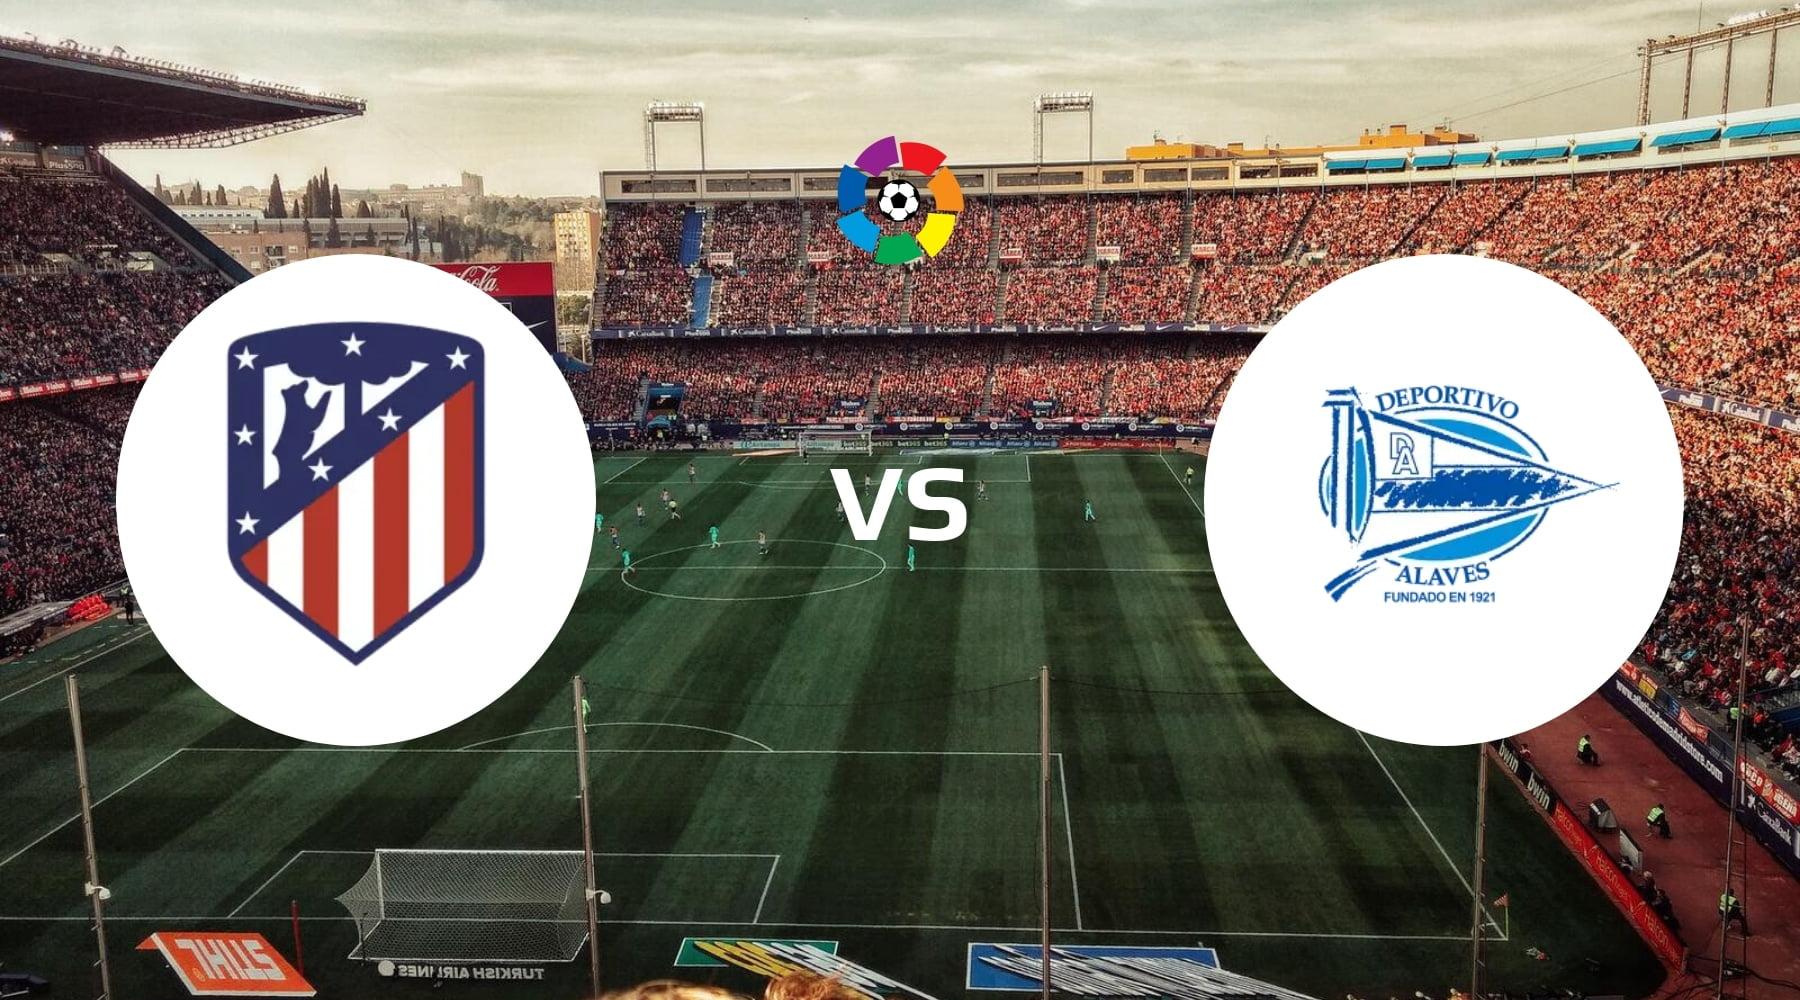 Atlético Madrid vs Alavés Betting